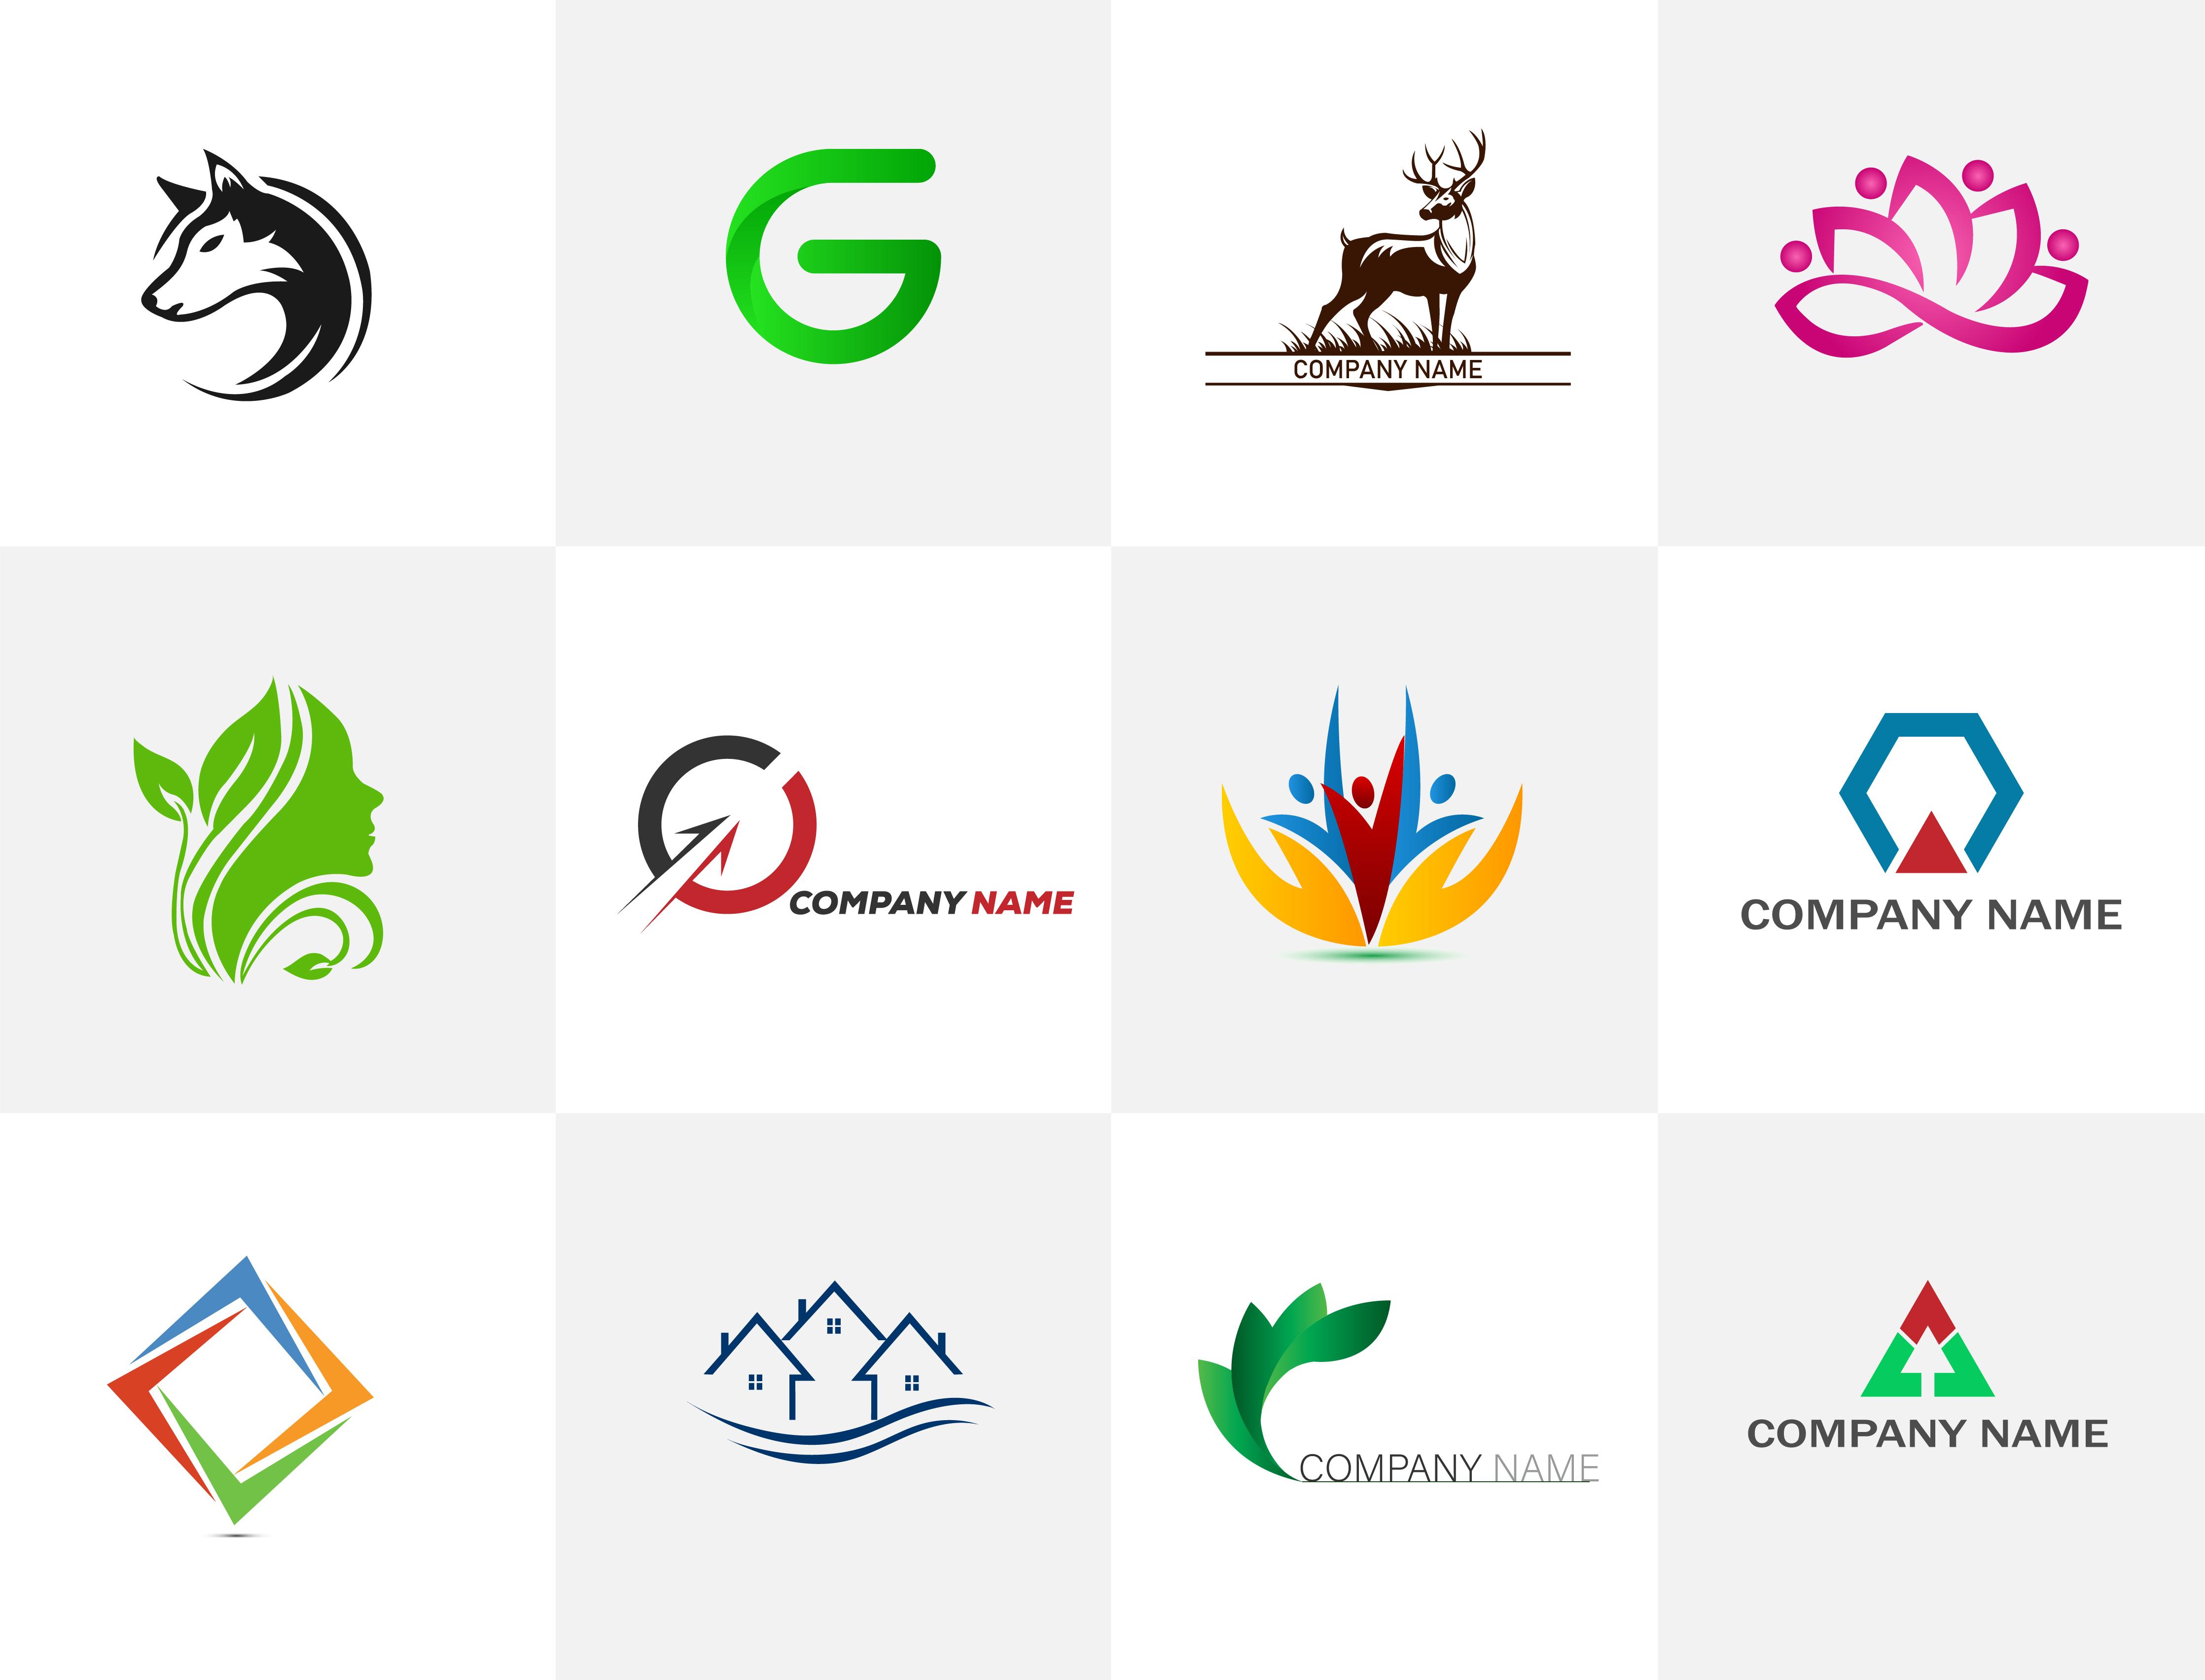 I will design minimalist modern business logo design